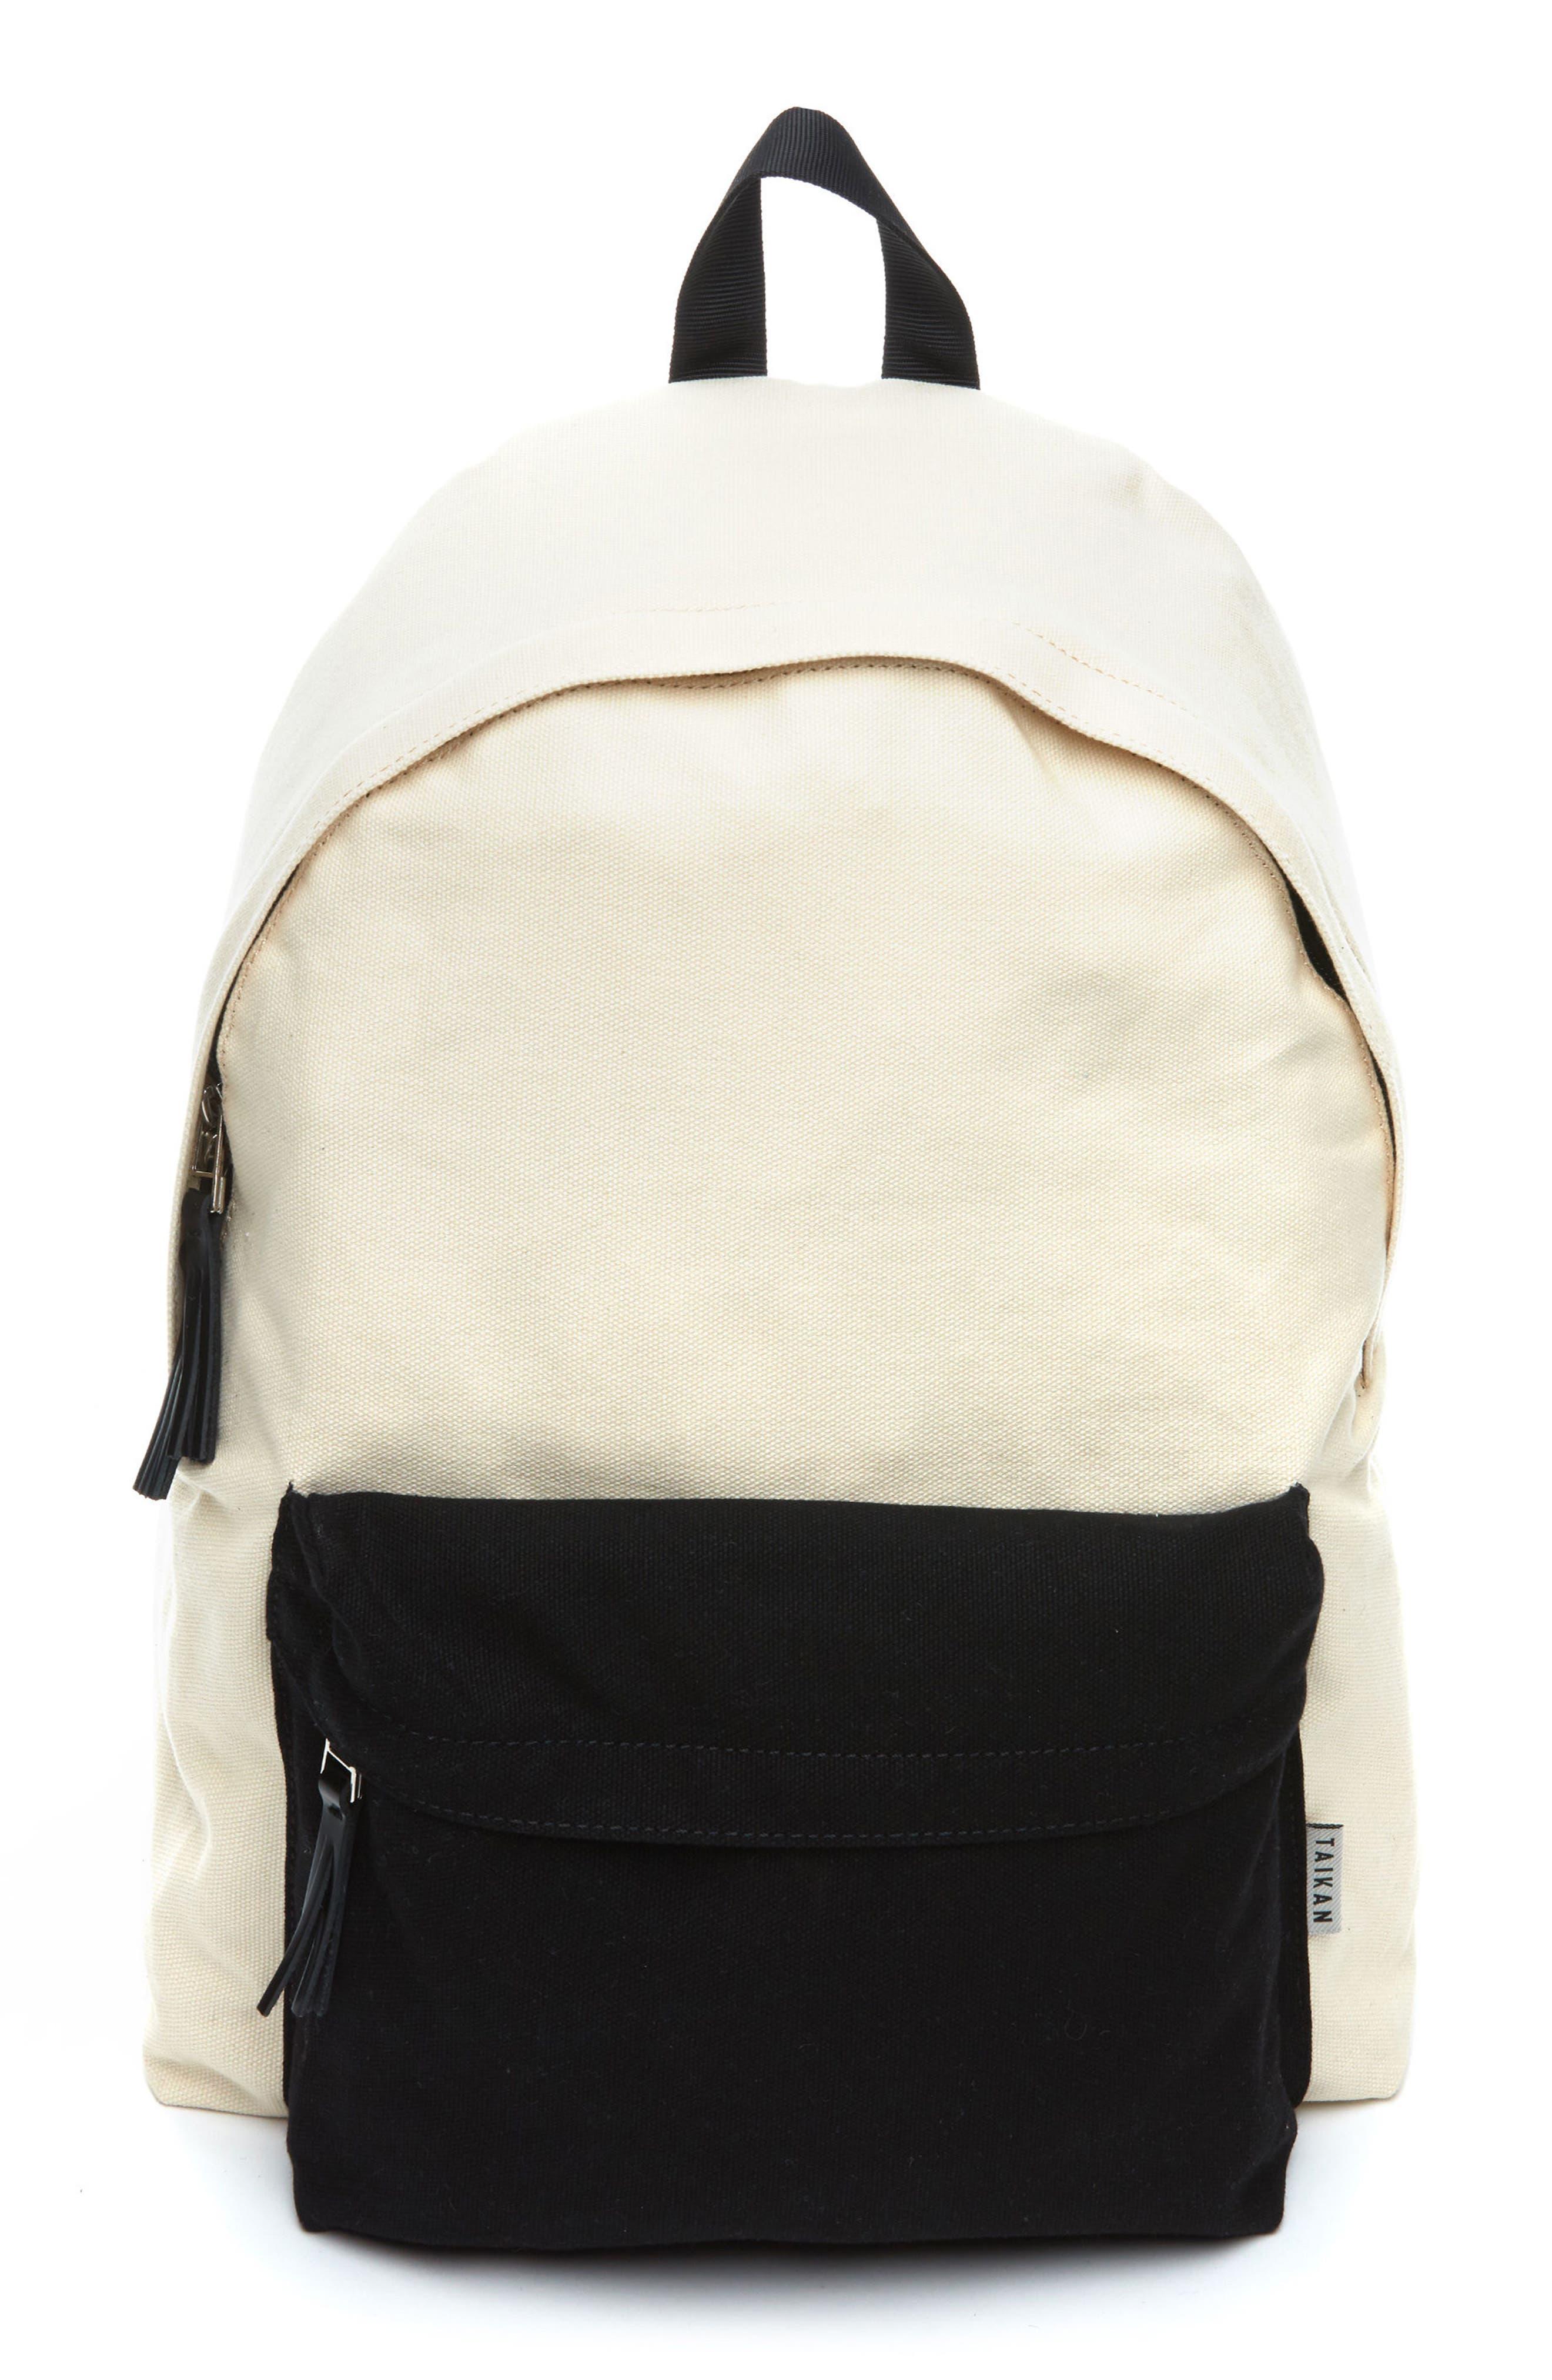 Hornet Backpack,                             Main thumbnail 1, color,                             Natural Cotton